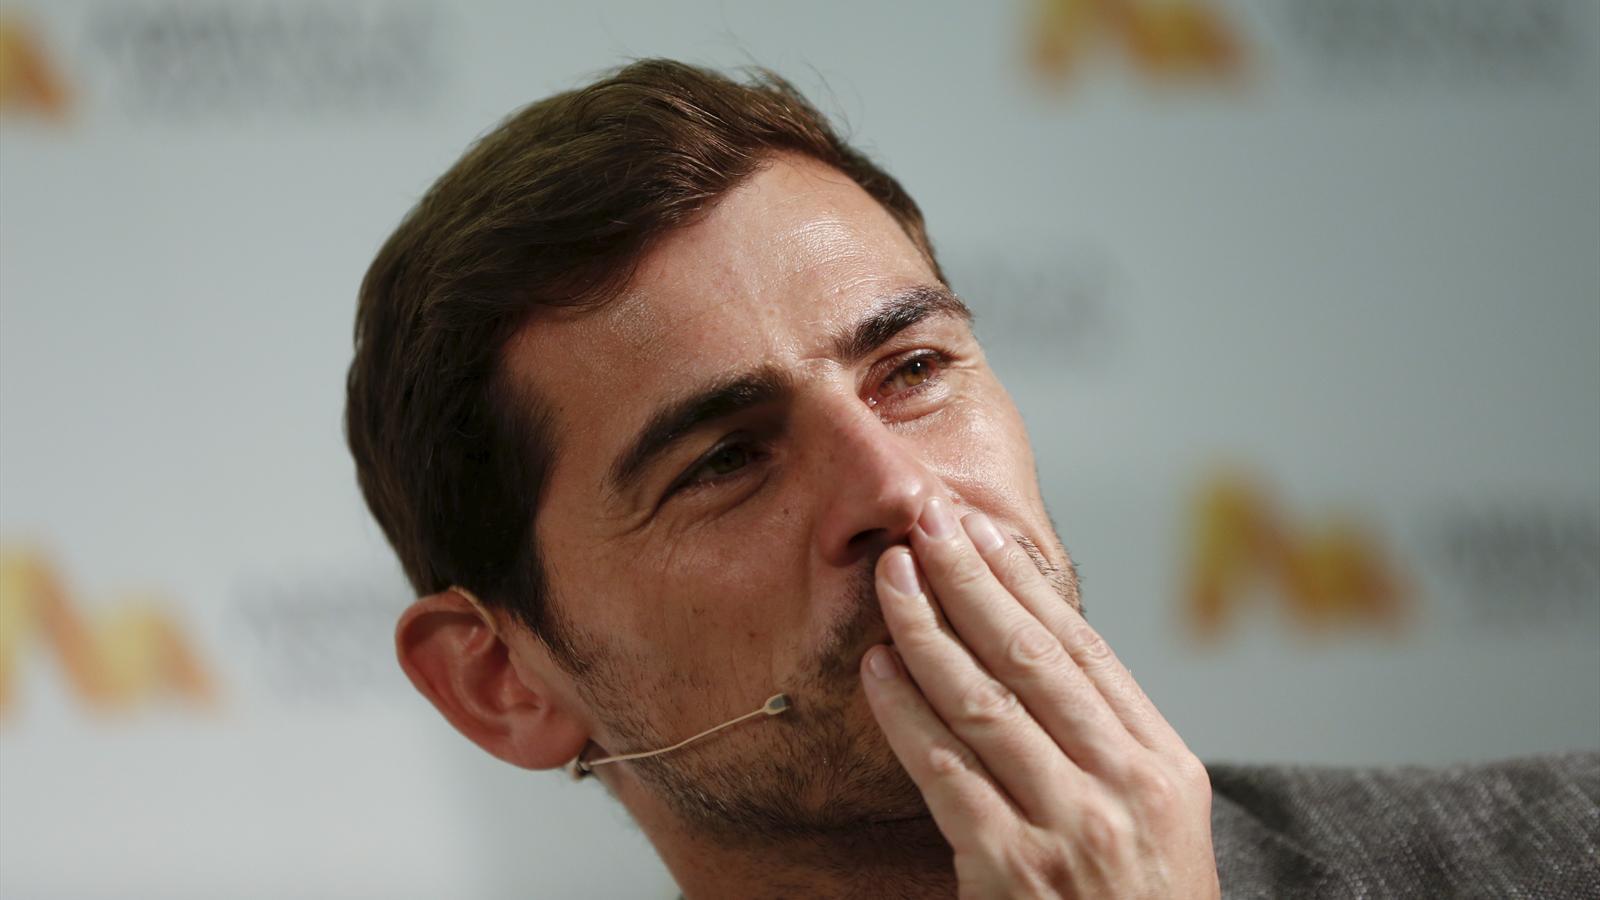 Spain's goalkeeper Iker Casillas gestures during a news conference in Madrid, Spain